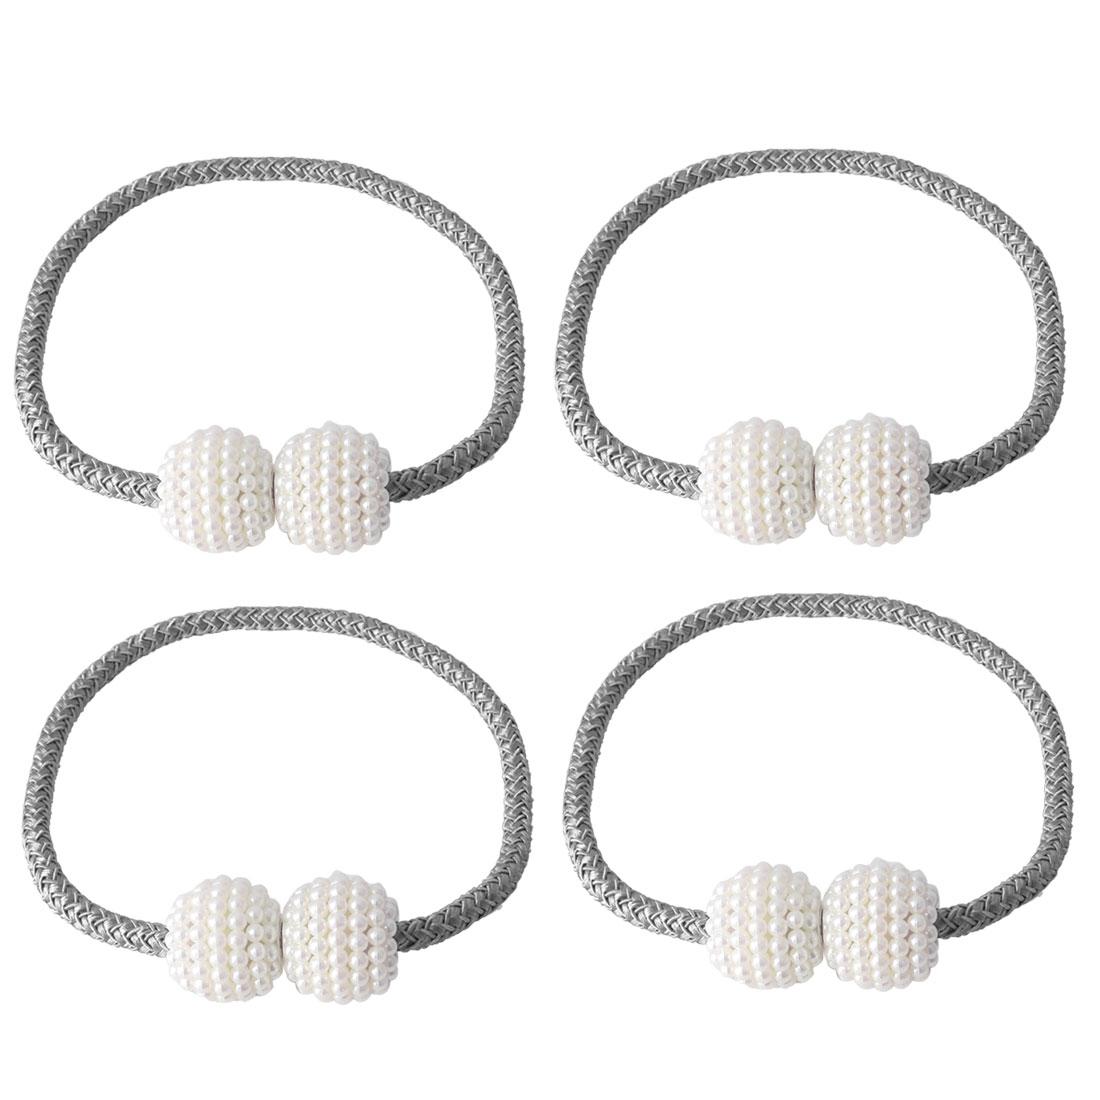 "4pcs Magnetic Curtain Tieback 19"" Holdbacks Decorative Curtain Holder, Grey"